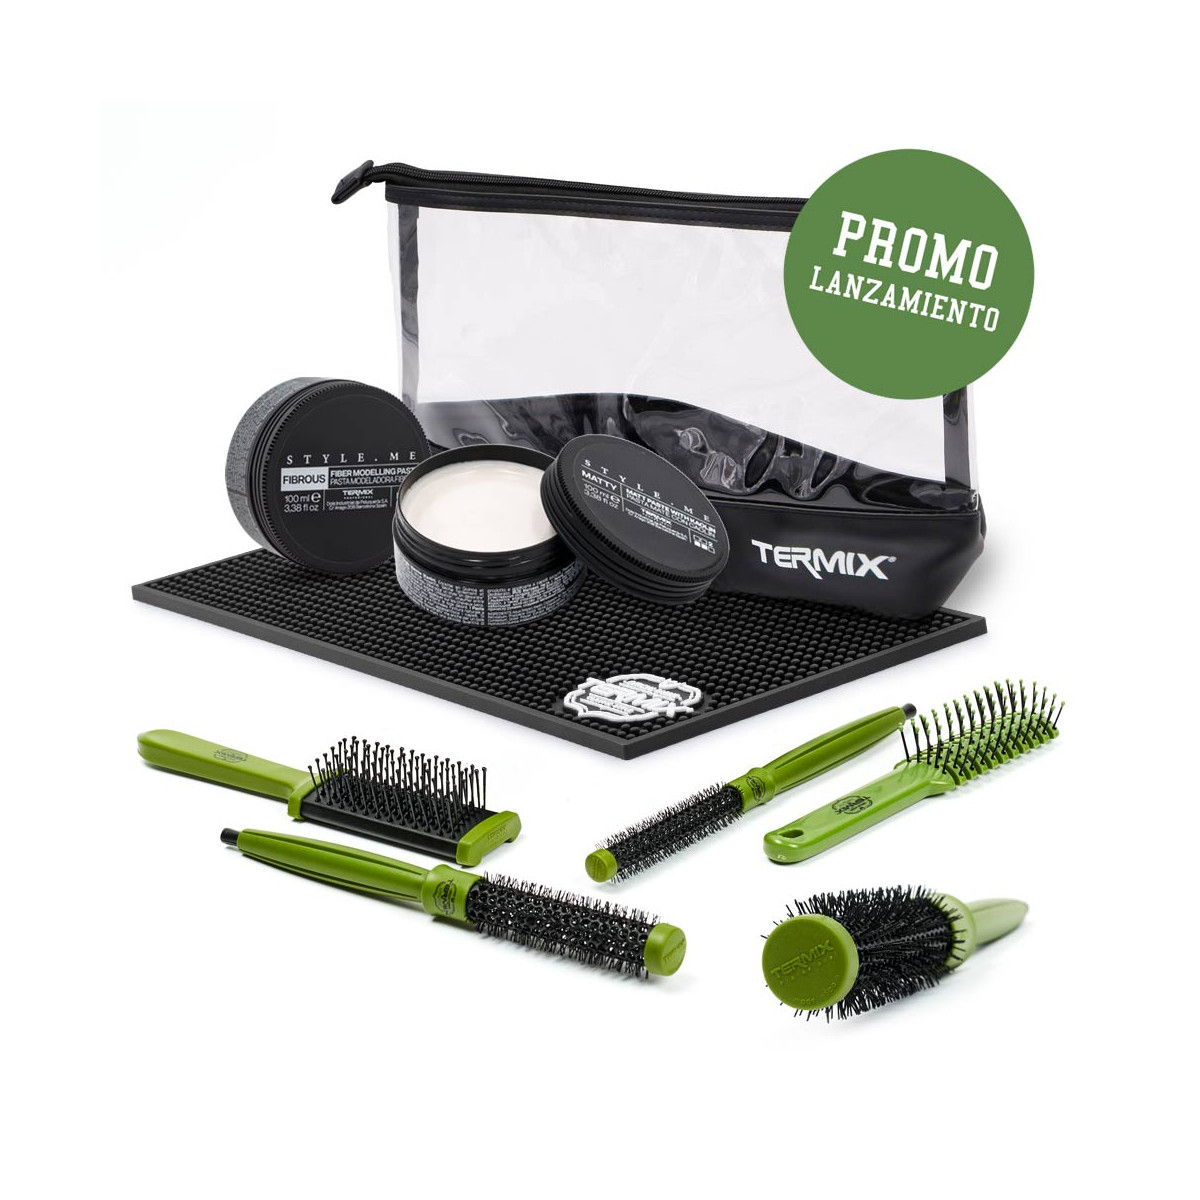 set-barber-promo-termix